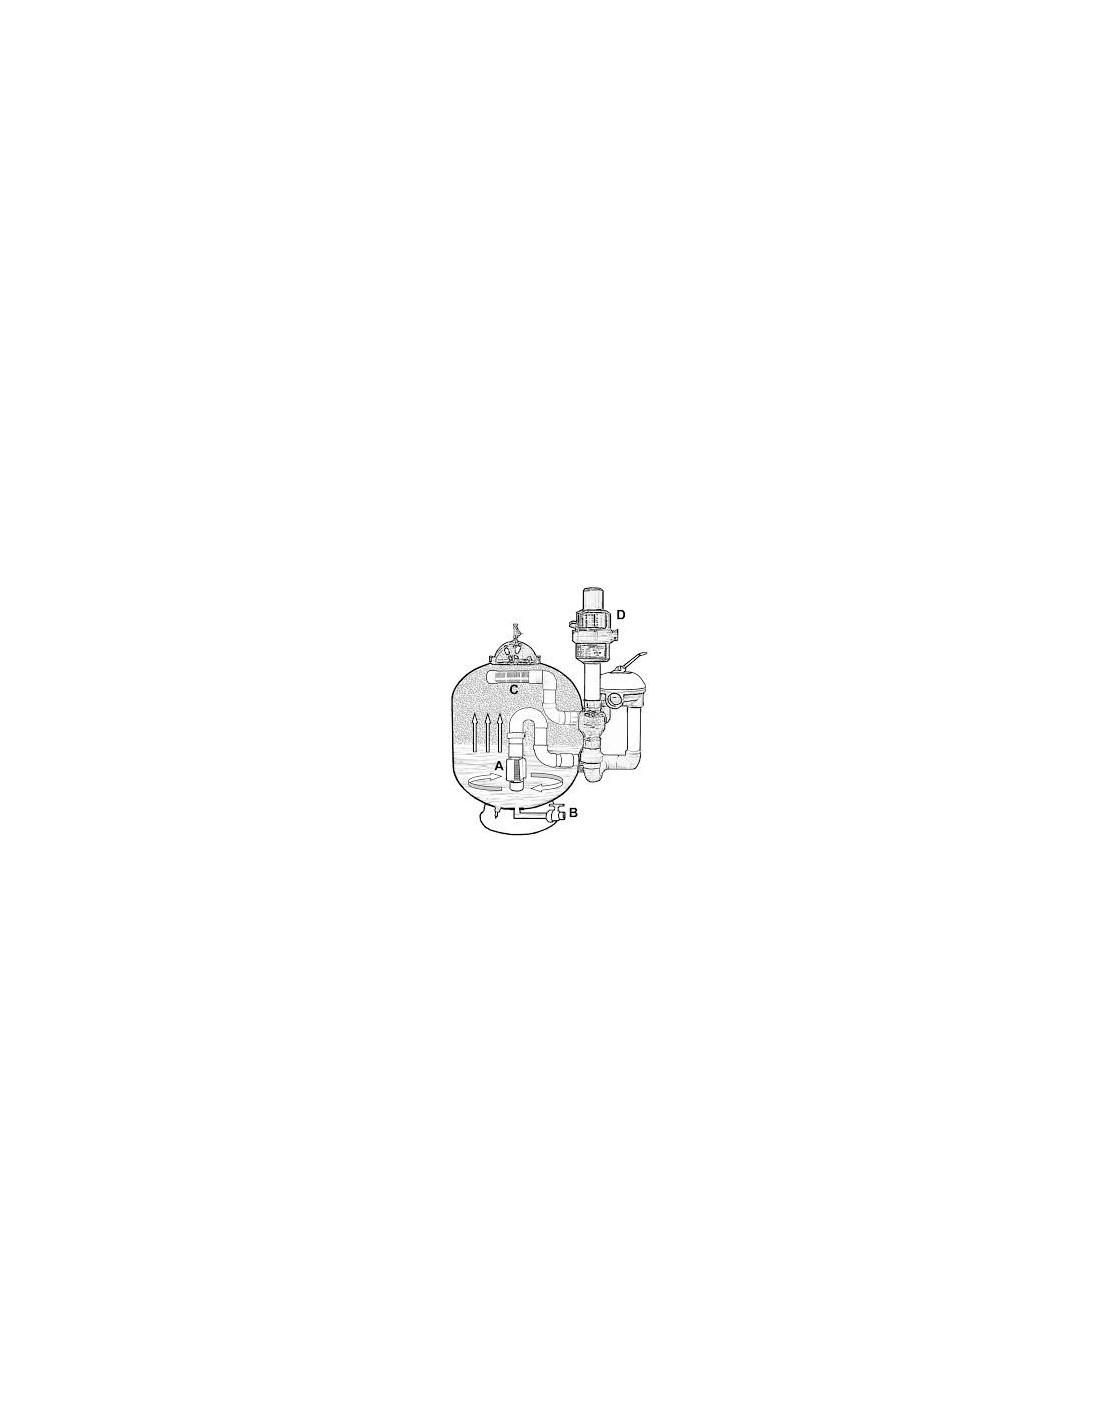 50 unidades remaches decorativos calavera Skull #27 motivo tachuelas cuero con tachuelas zierniete remacha